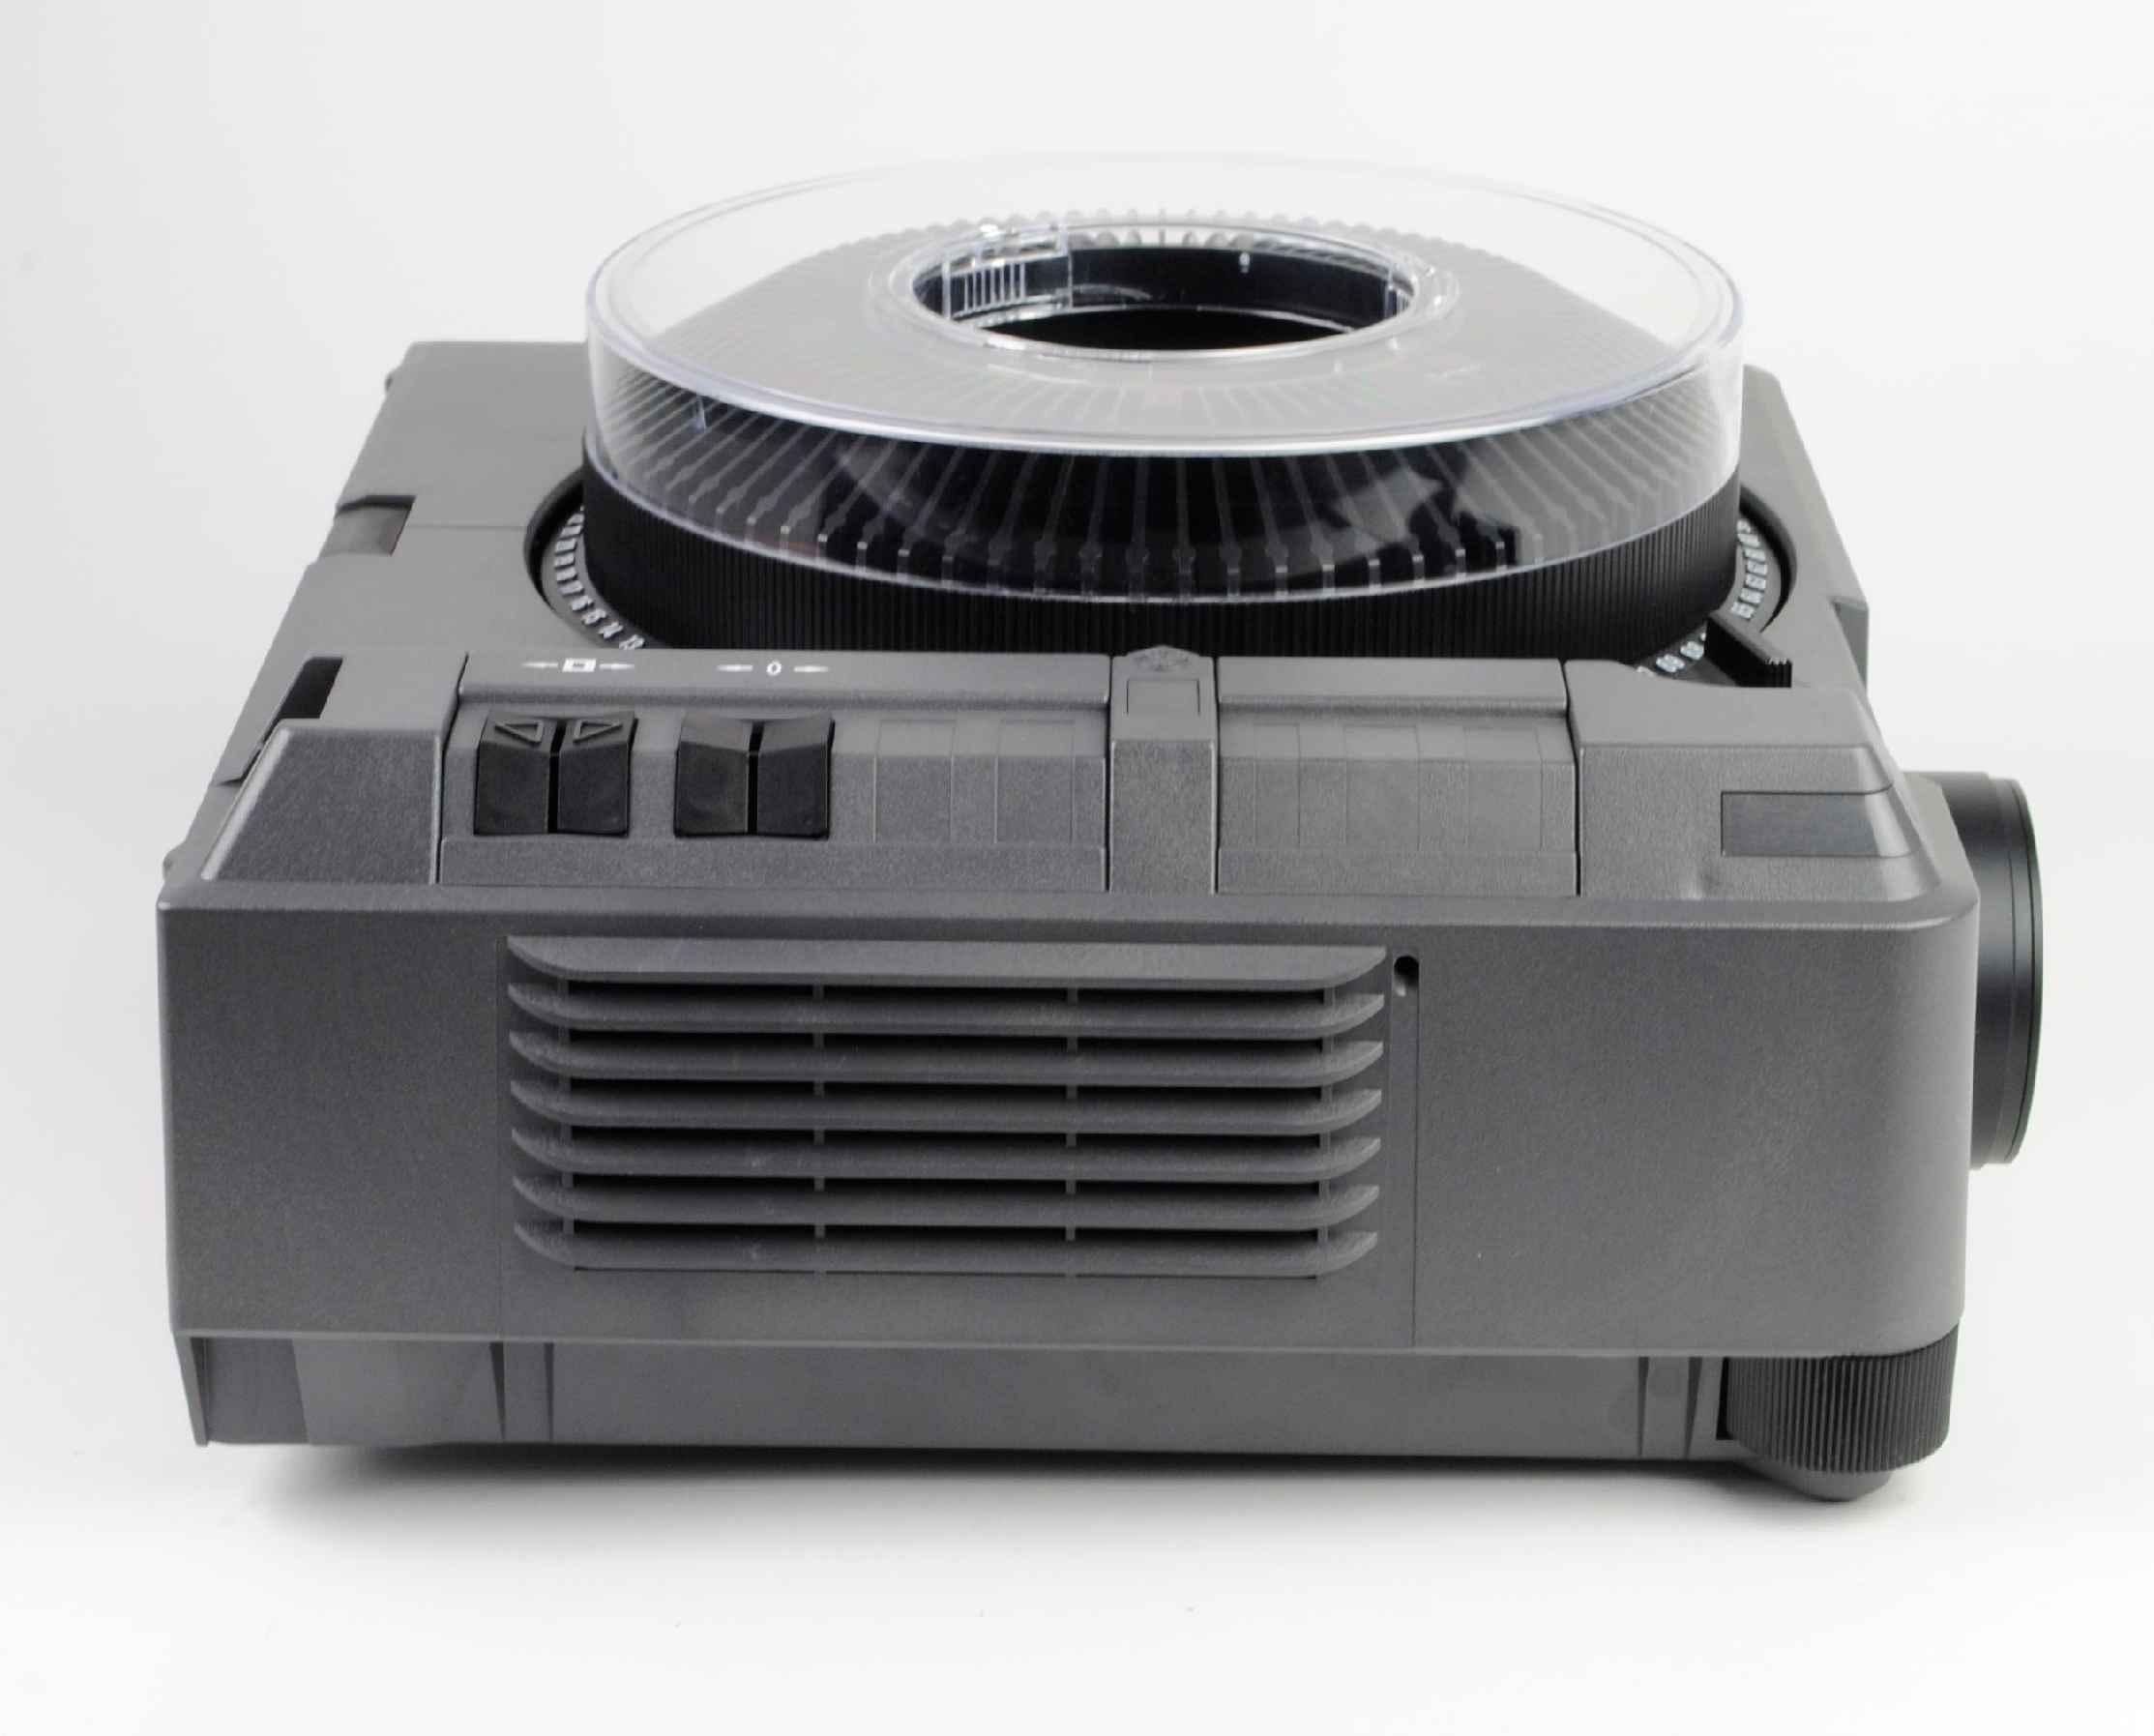 kodak ektapro 320 slide projectors spare parts and information rh van eck net Yamaha Service Manuals PDF Downloadable Online Chevrolet Repair Manuals